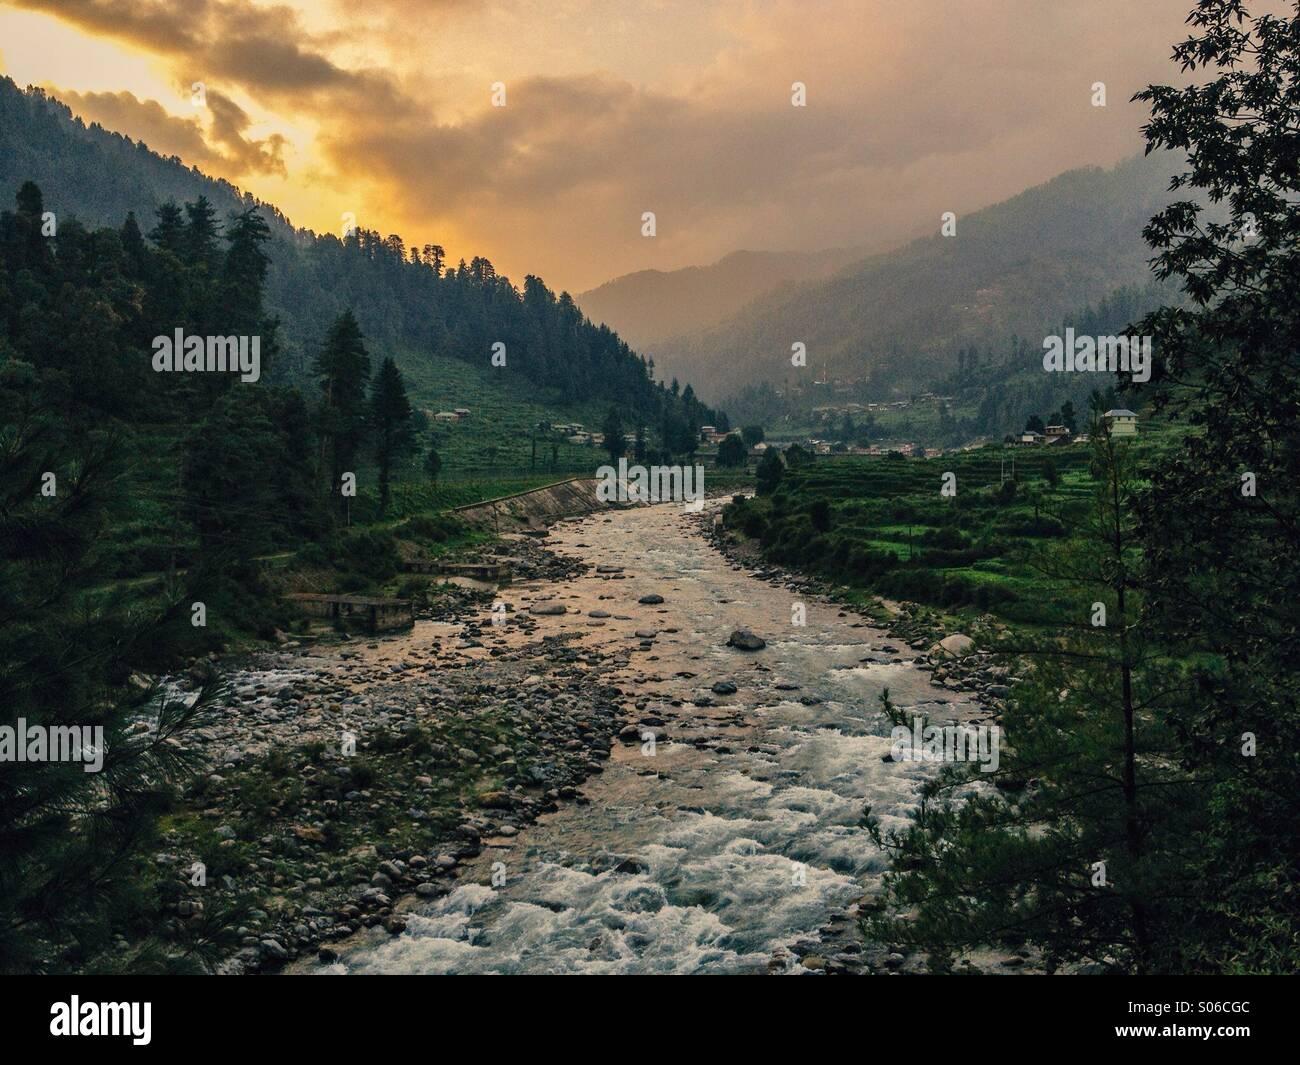 River Uhl flowing at a sunset through Barot, Himachal Pradesh, India - Stock Image